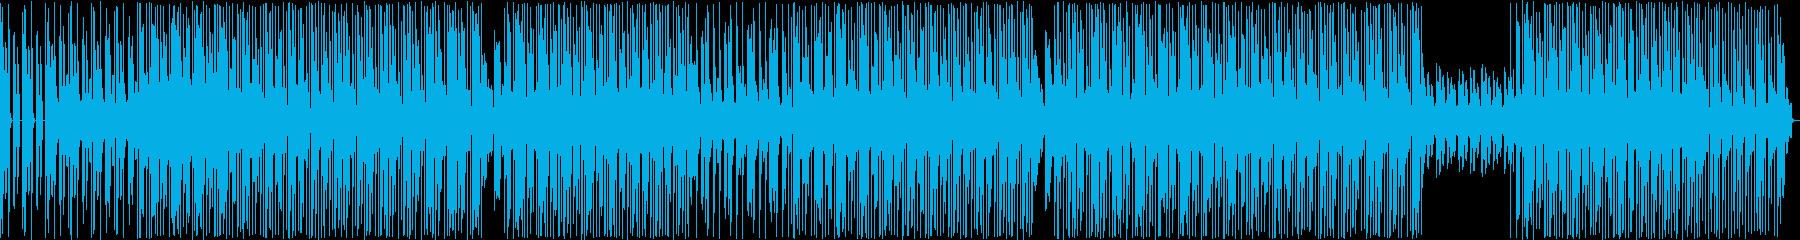 HIPHOPトラック 爽やか系 軽やか系の再生済みの波形